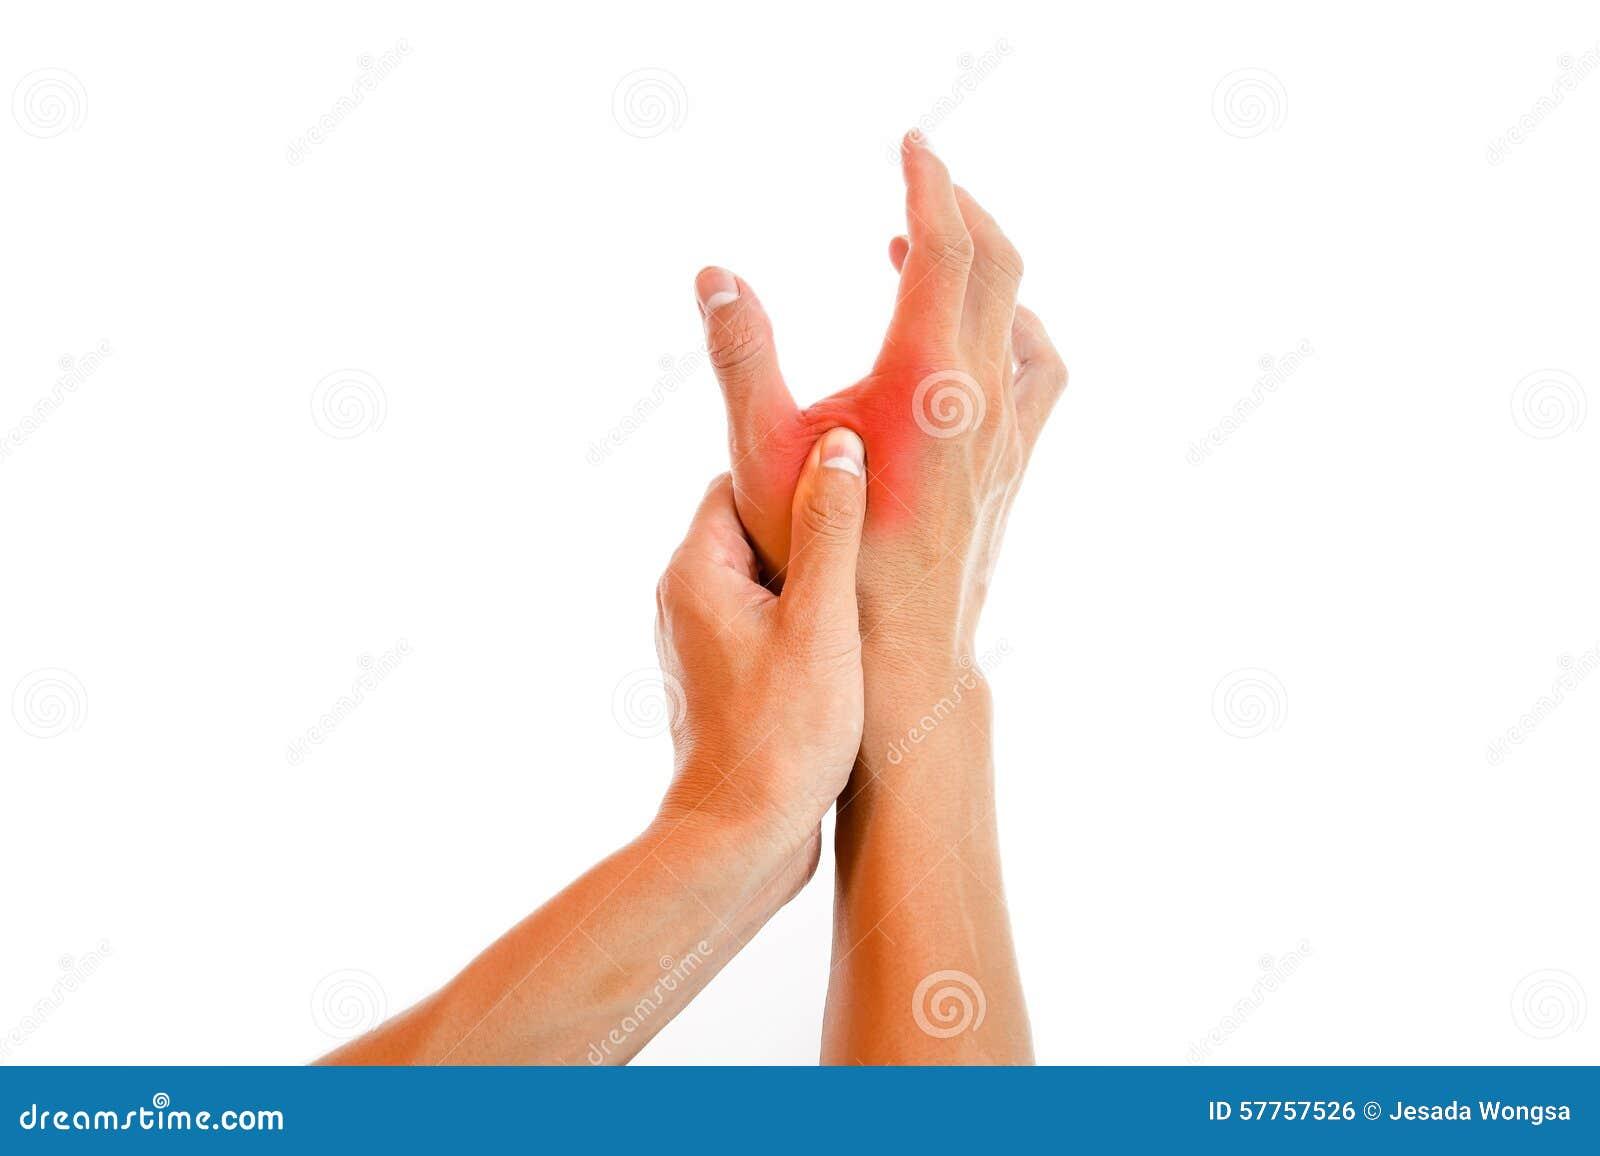 hand pain stock photo image 57757526. Black Bedroom Furniture Sets. Home Design Ideas